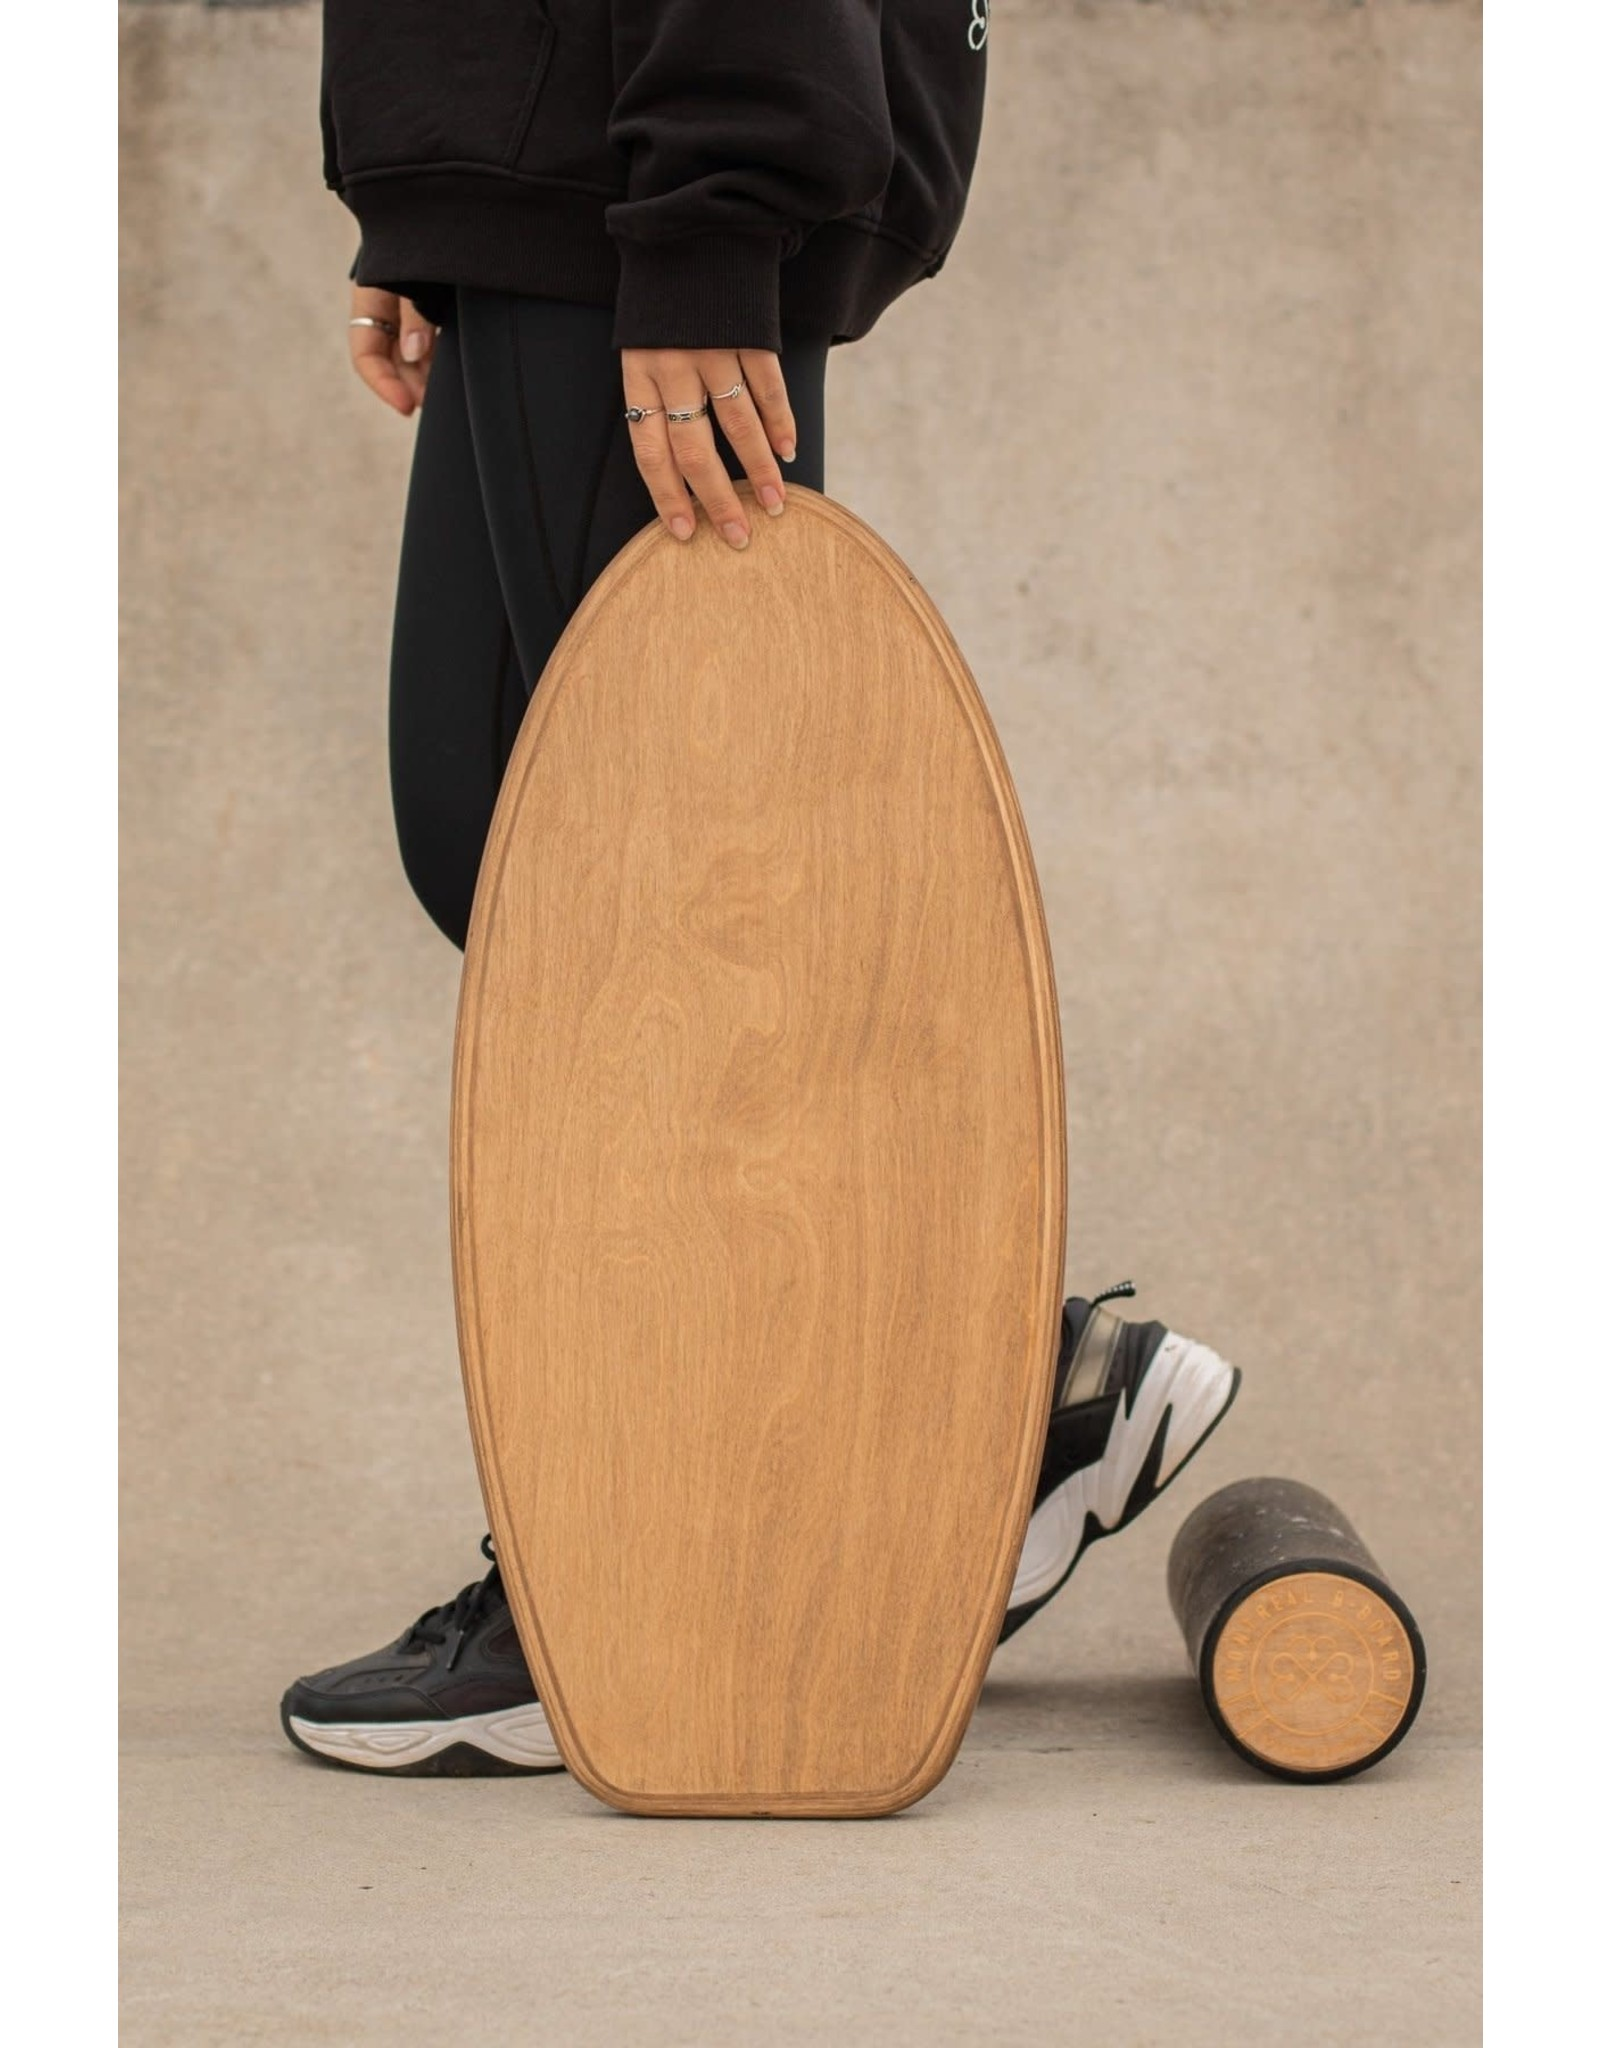 Montreal B-Board Balance board new roll S.U.P. shape